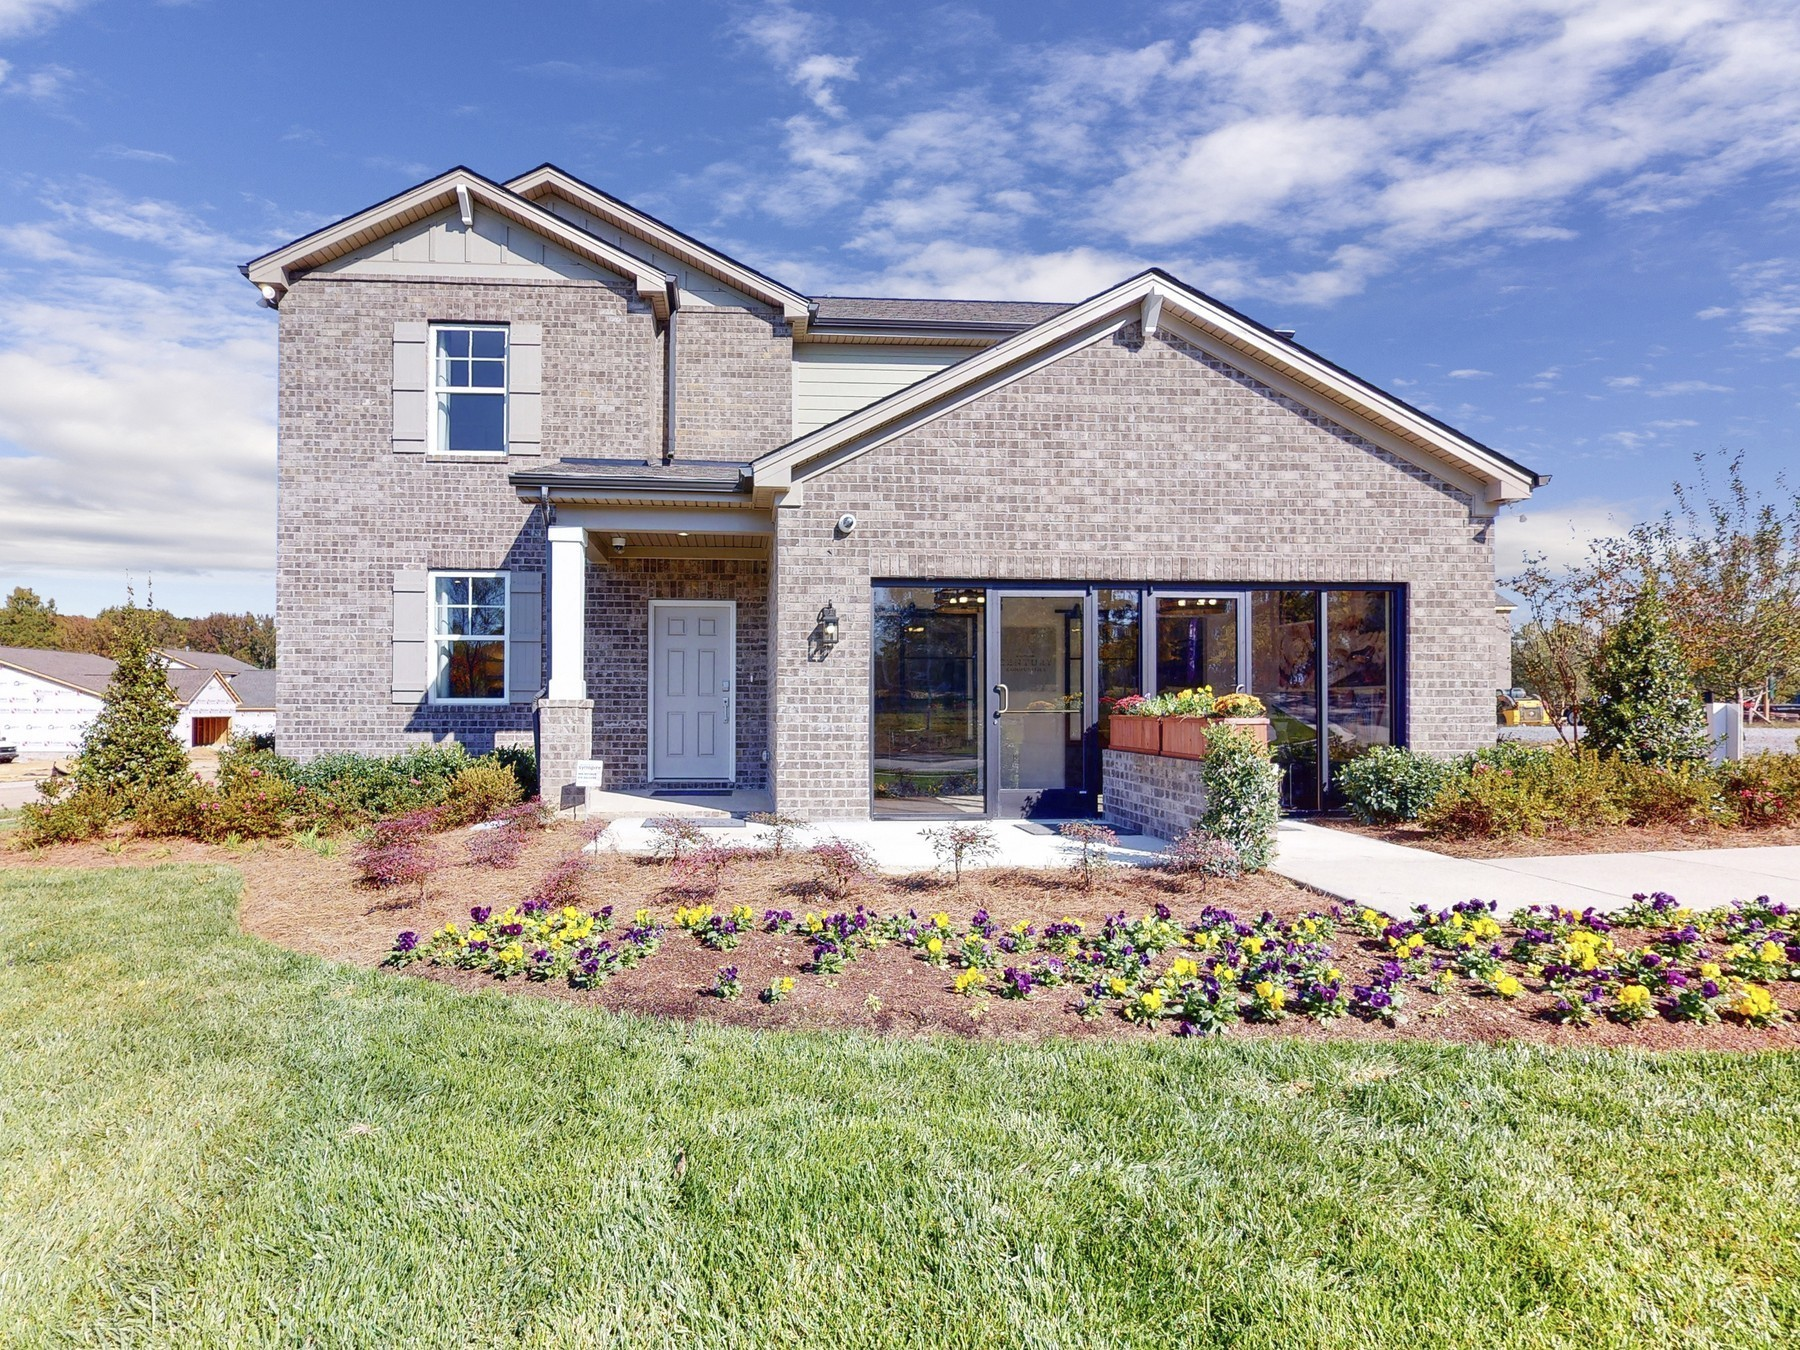 4425 Socata Ct. Property Photo - Cross Plains, TN real estate listing